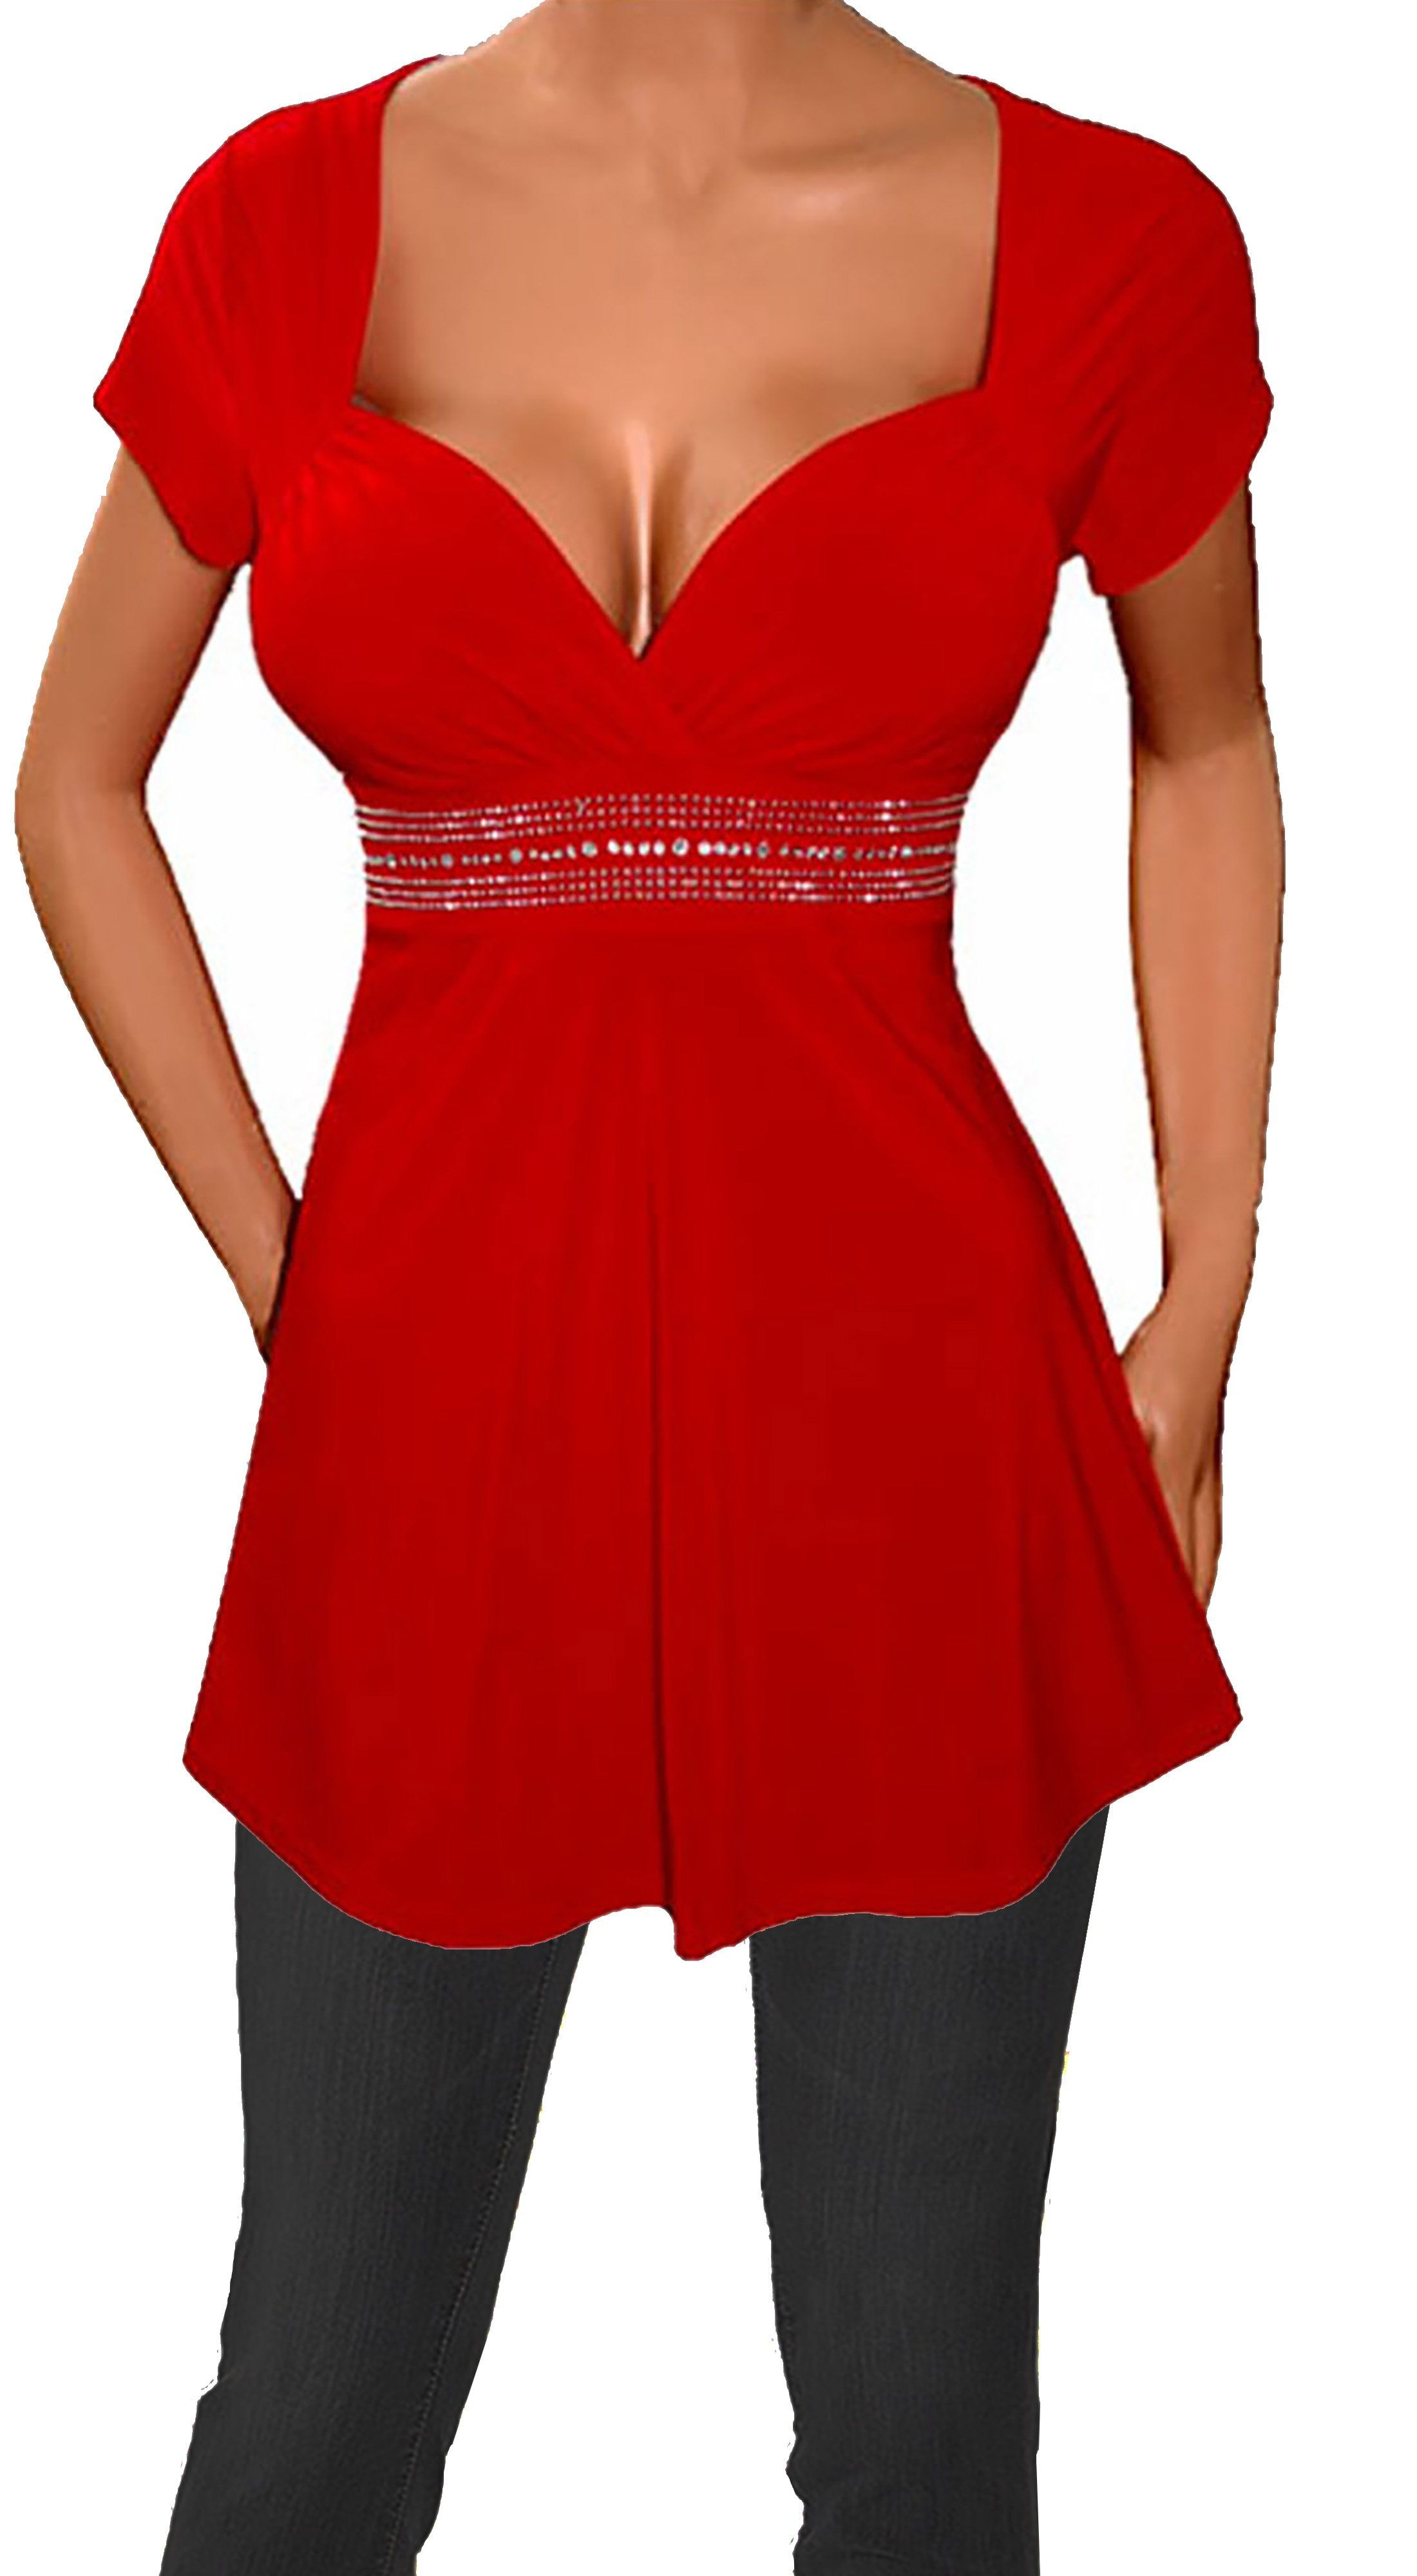 4729383568dc44 Funfash Plus Size Top Red Empire Waist Women s Plus Size Shirt Blouse  Clothing